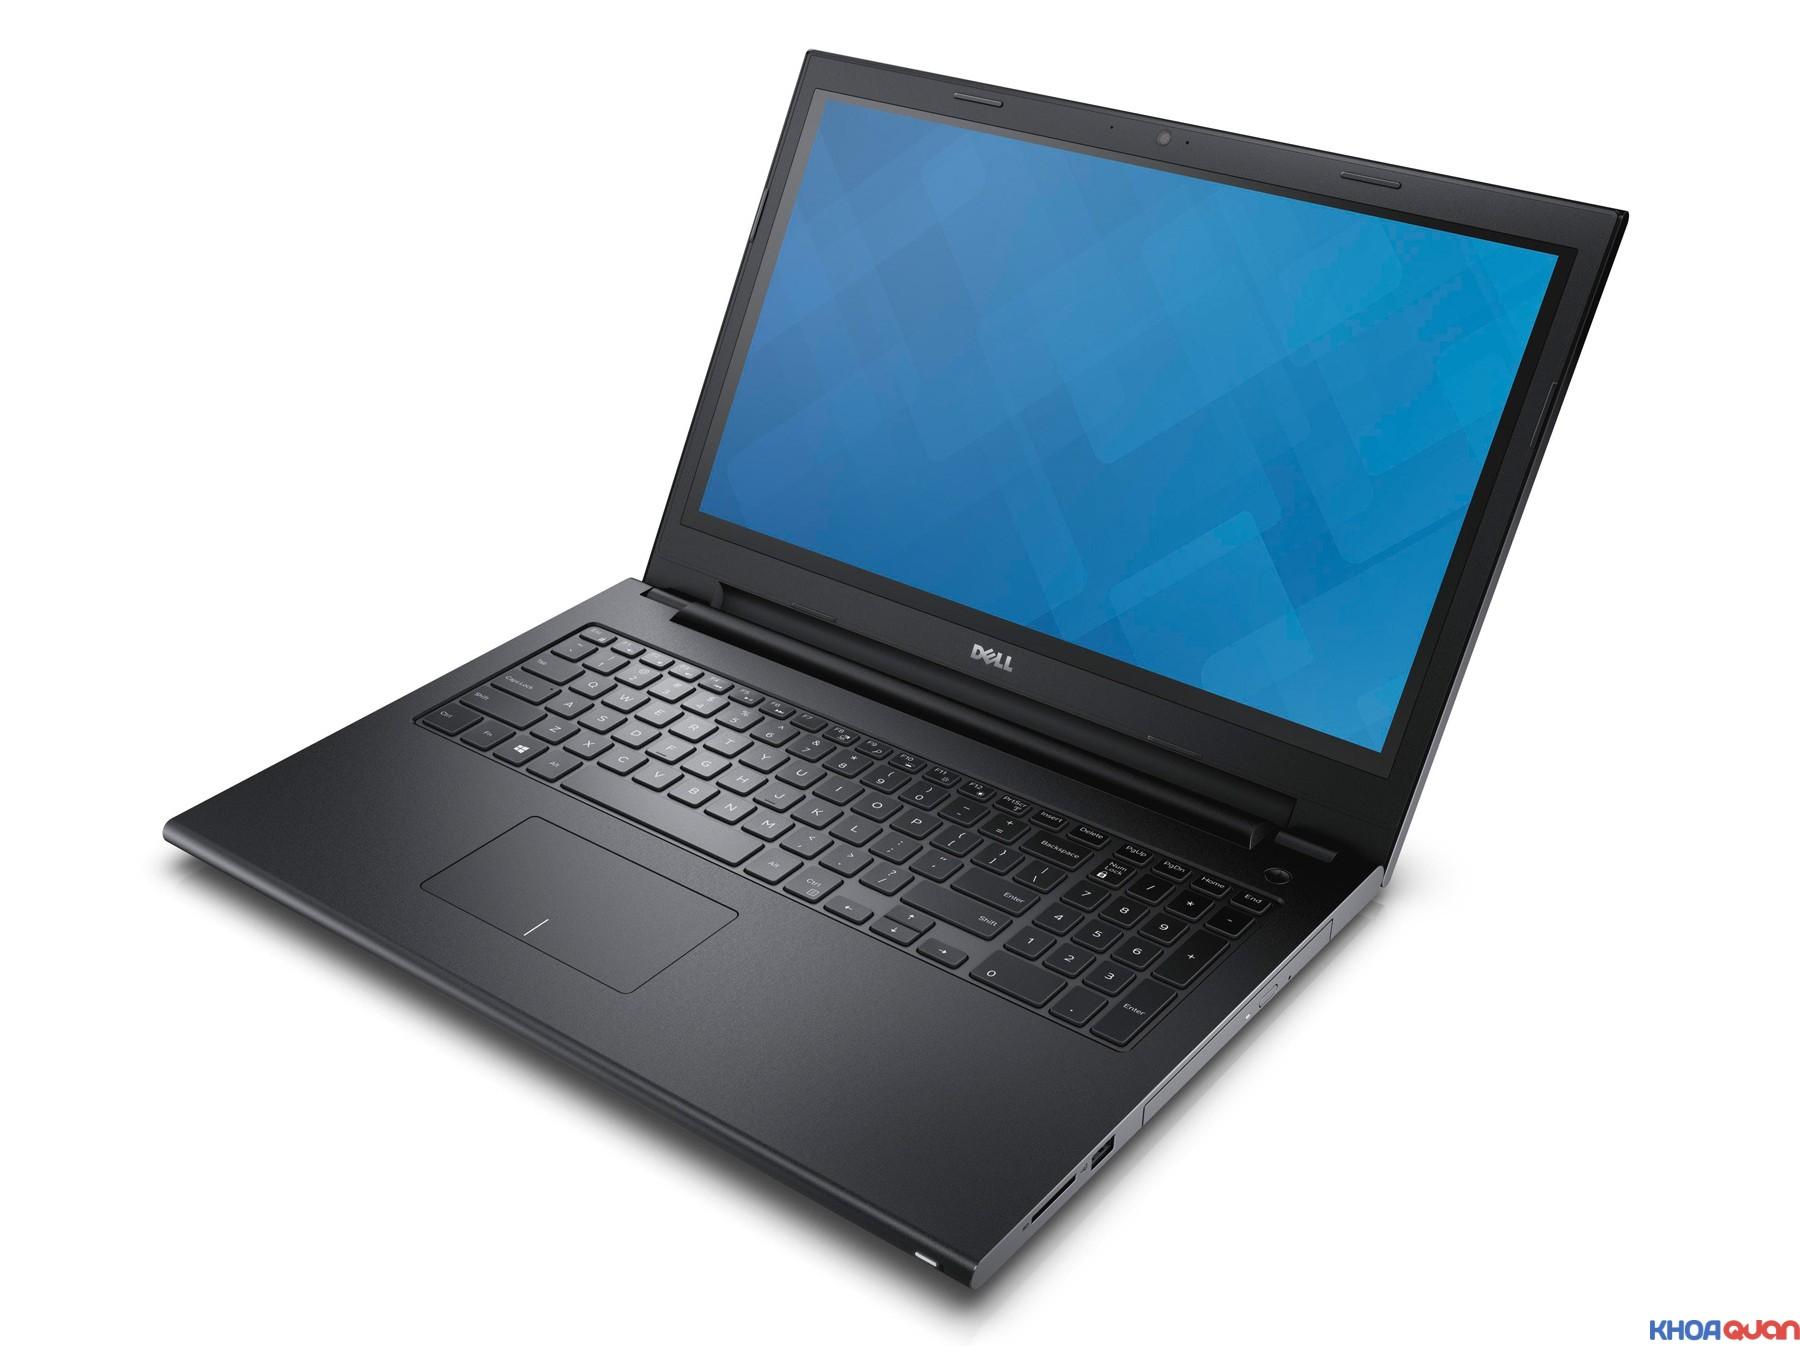 Dell Inspiron 3542 I5 15-1